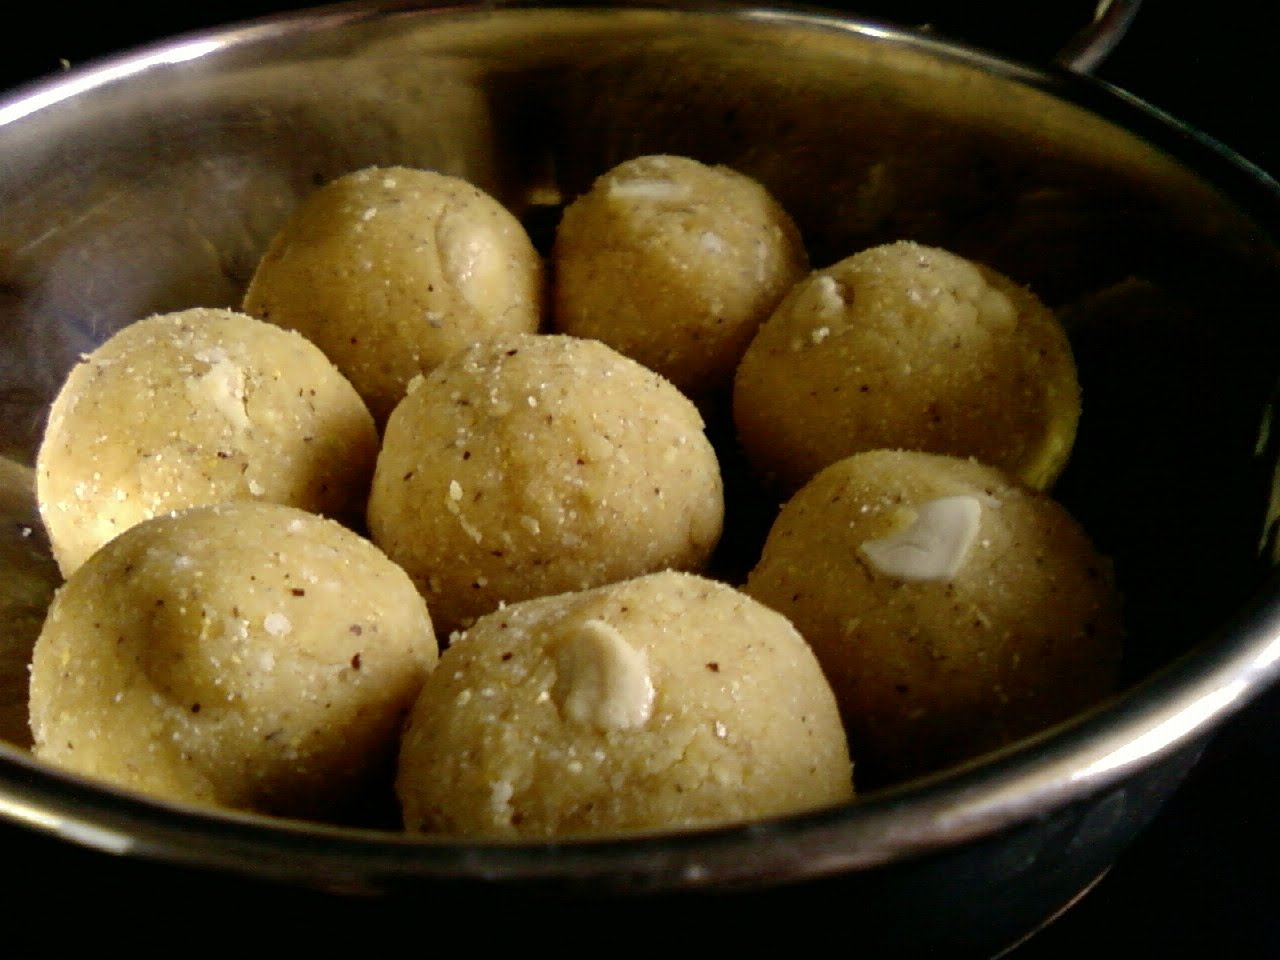 Putnala Pappu Kobbari Laddu ~ Dalia And Coconut Laddu